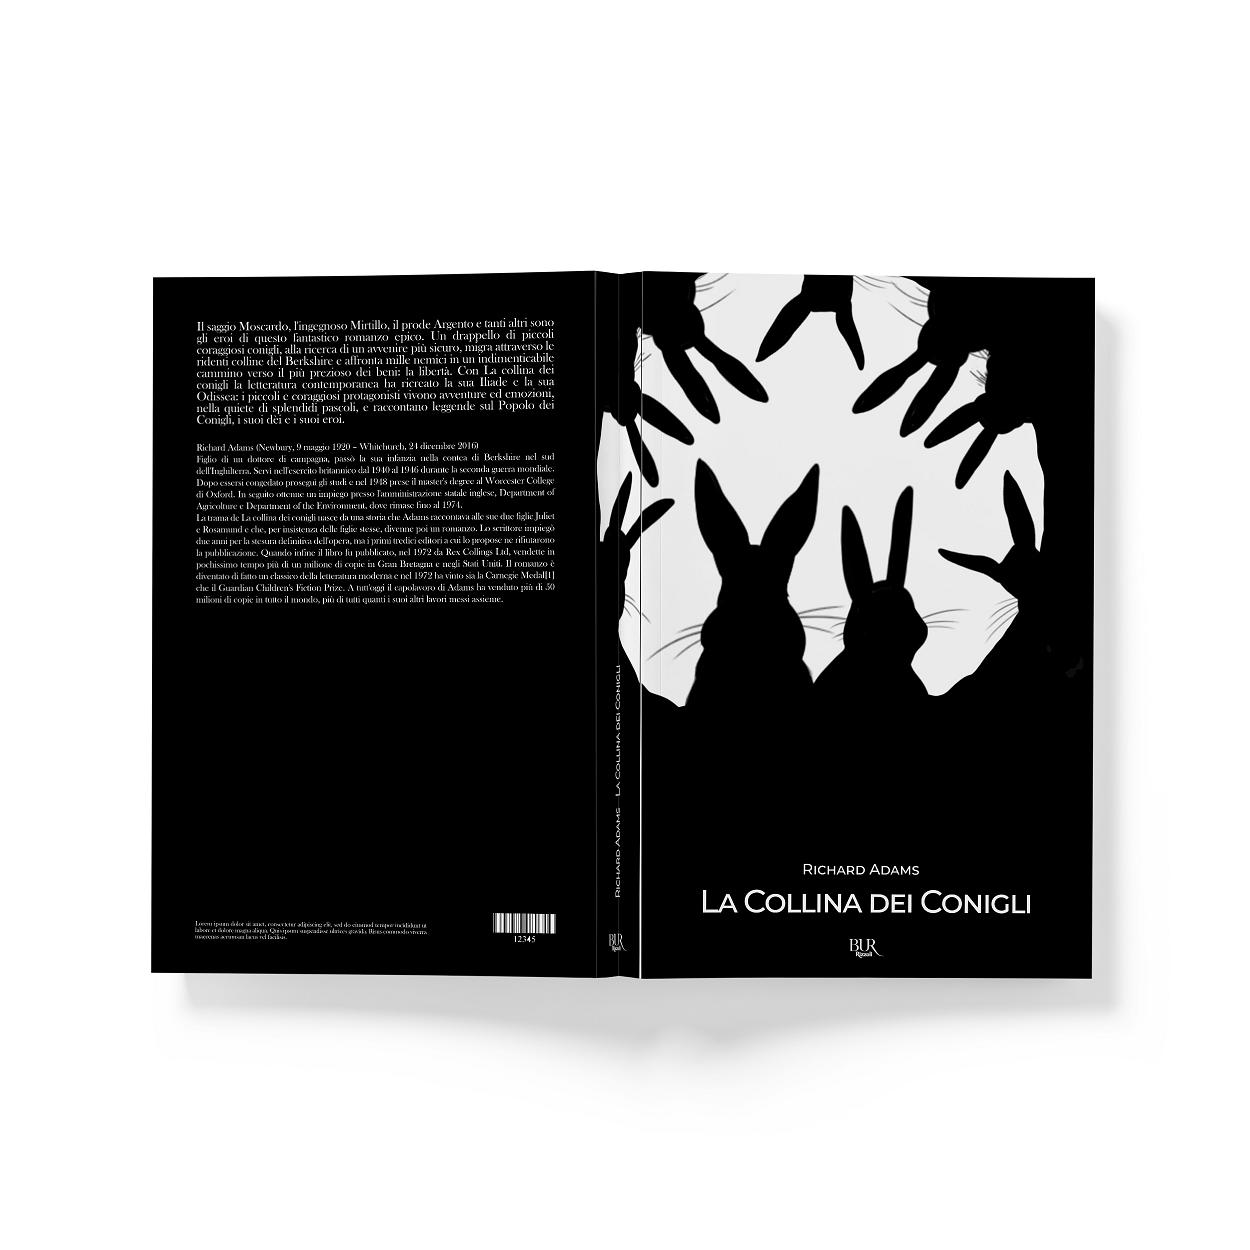 mulas-chiara-illustration-watership-down-collina-dei-conigli-richard-adams-netflix-chimù-illustration-cover (3)